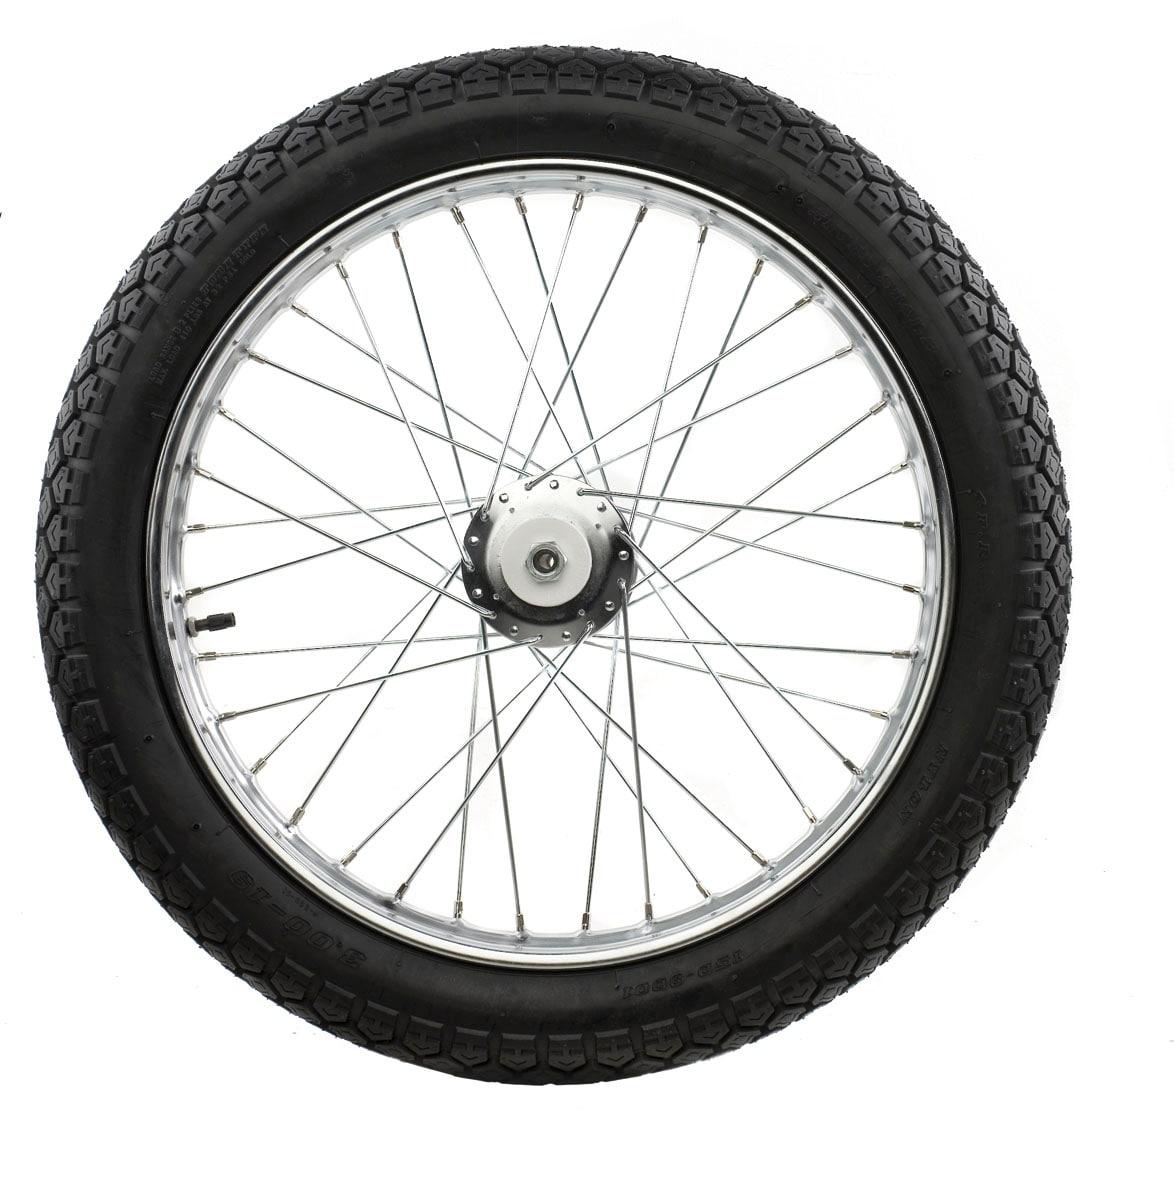 "Finntack Rockcart hjul, 19""x3,00 (selges enkeltvis)"